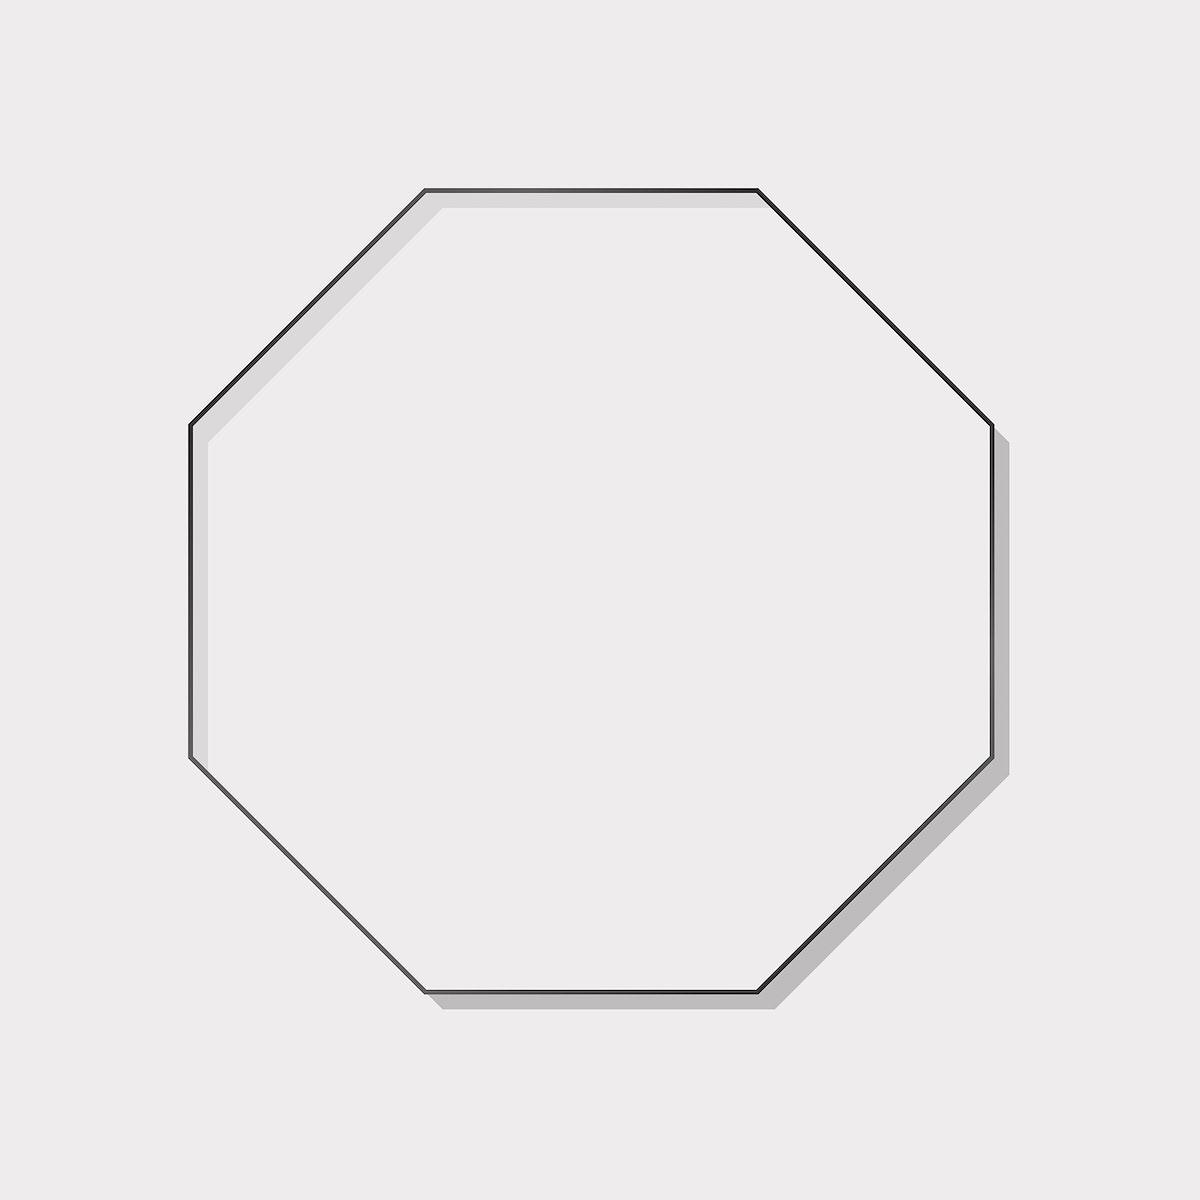 Octagon black  frame on a blank background vector